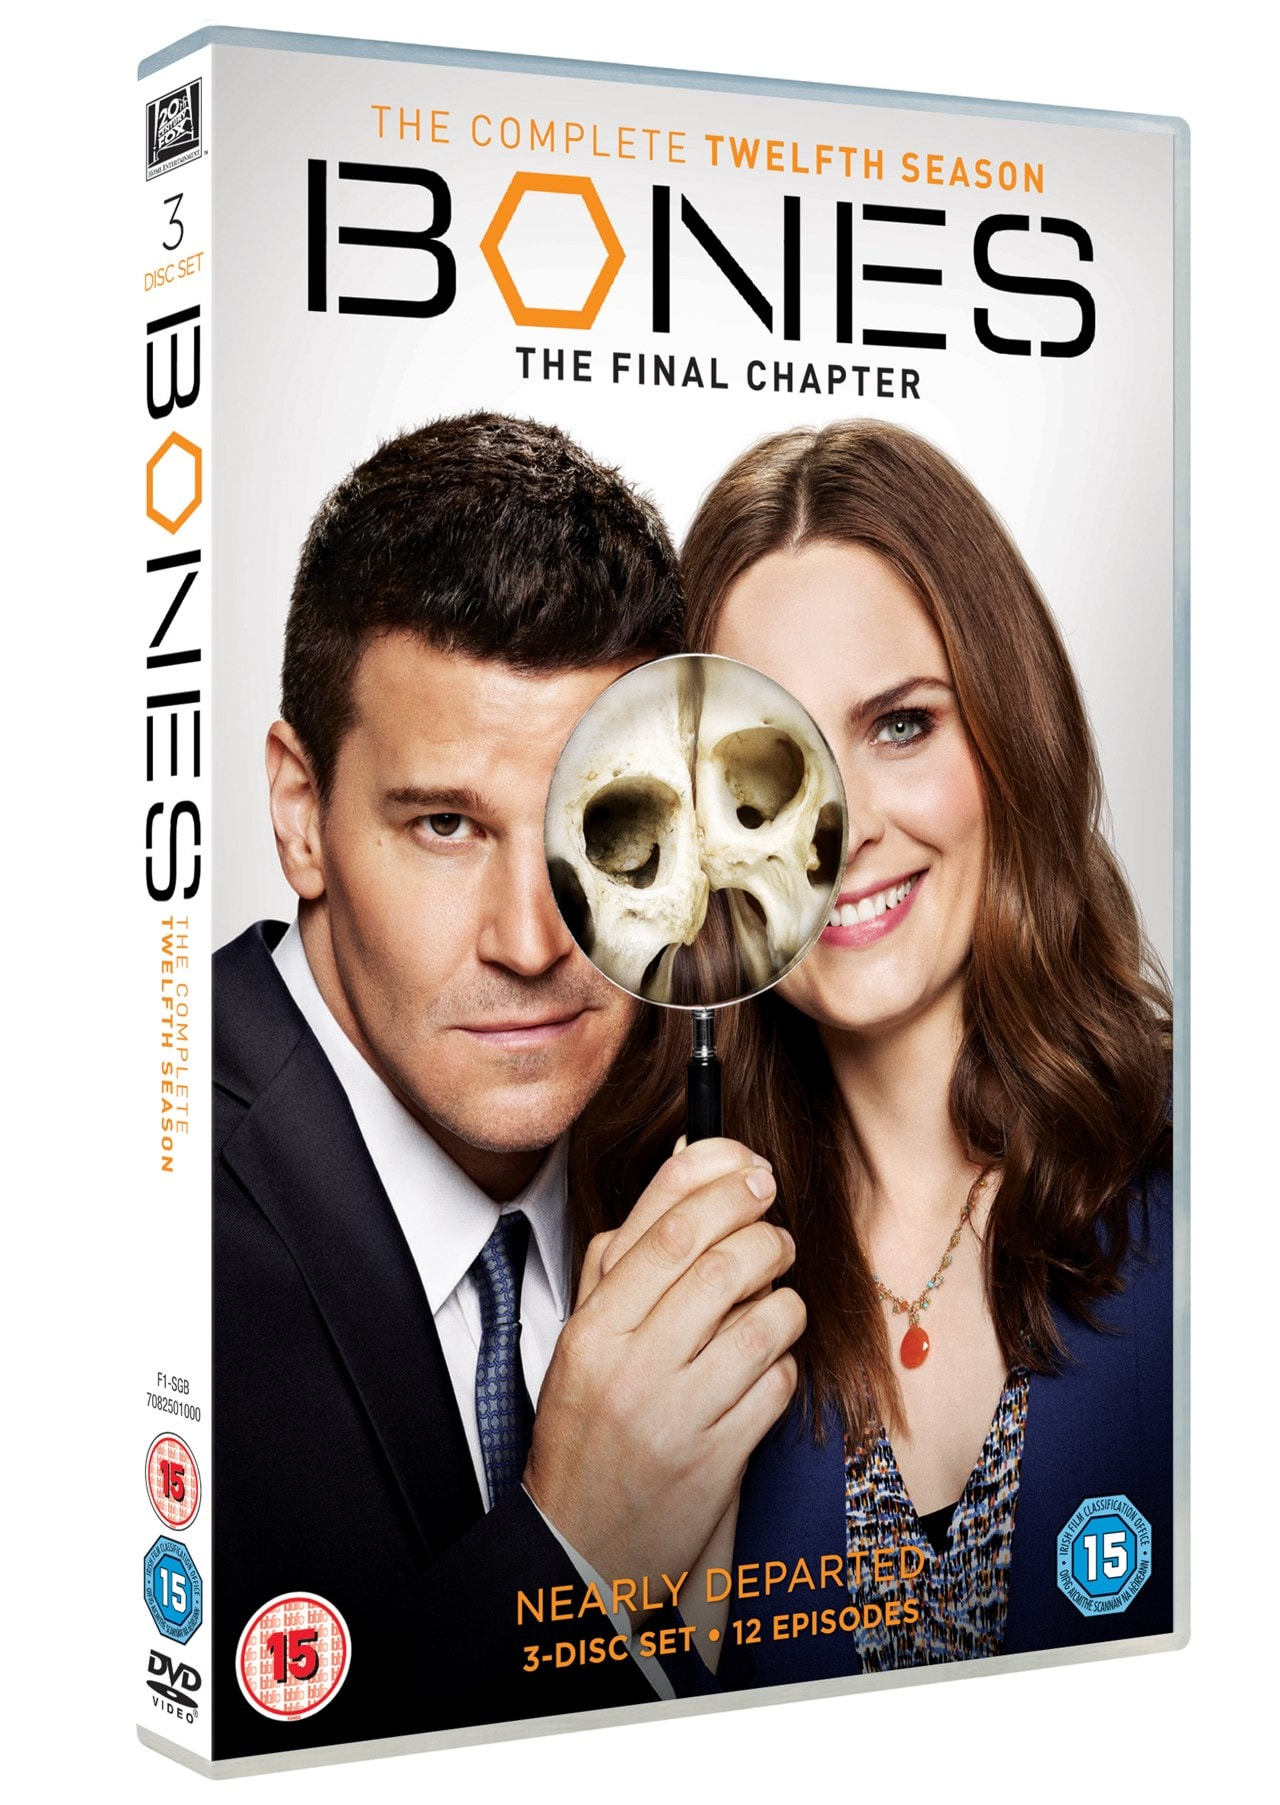 Bones: The Complete Twelfth Season - The Final Chapter - 2